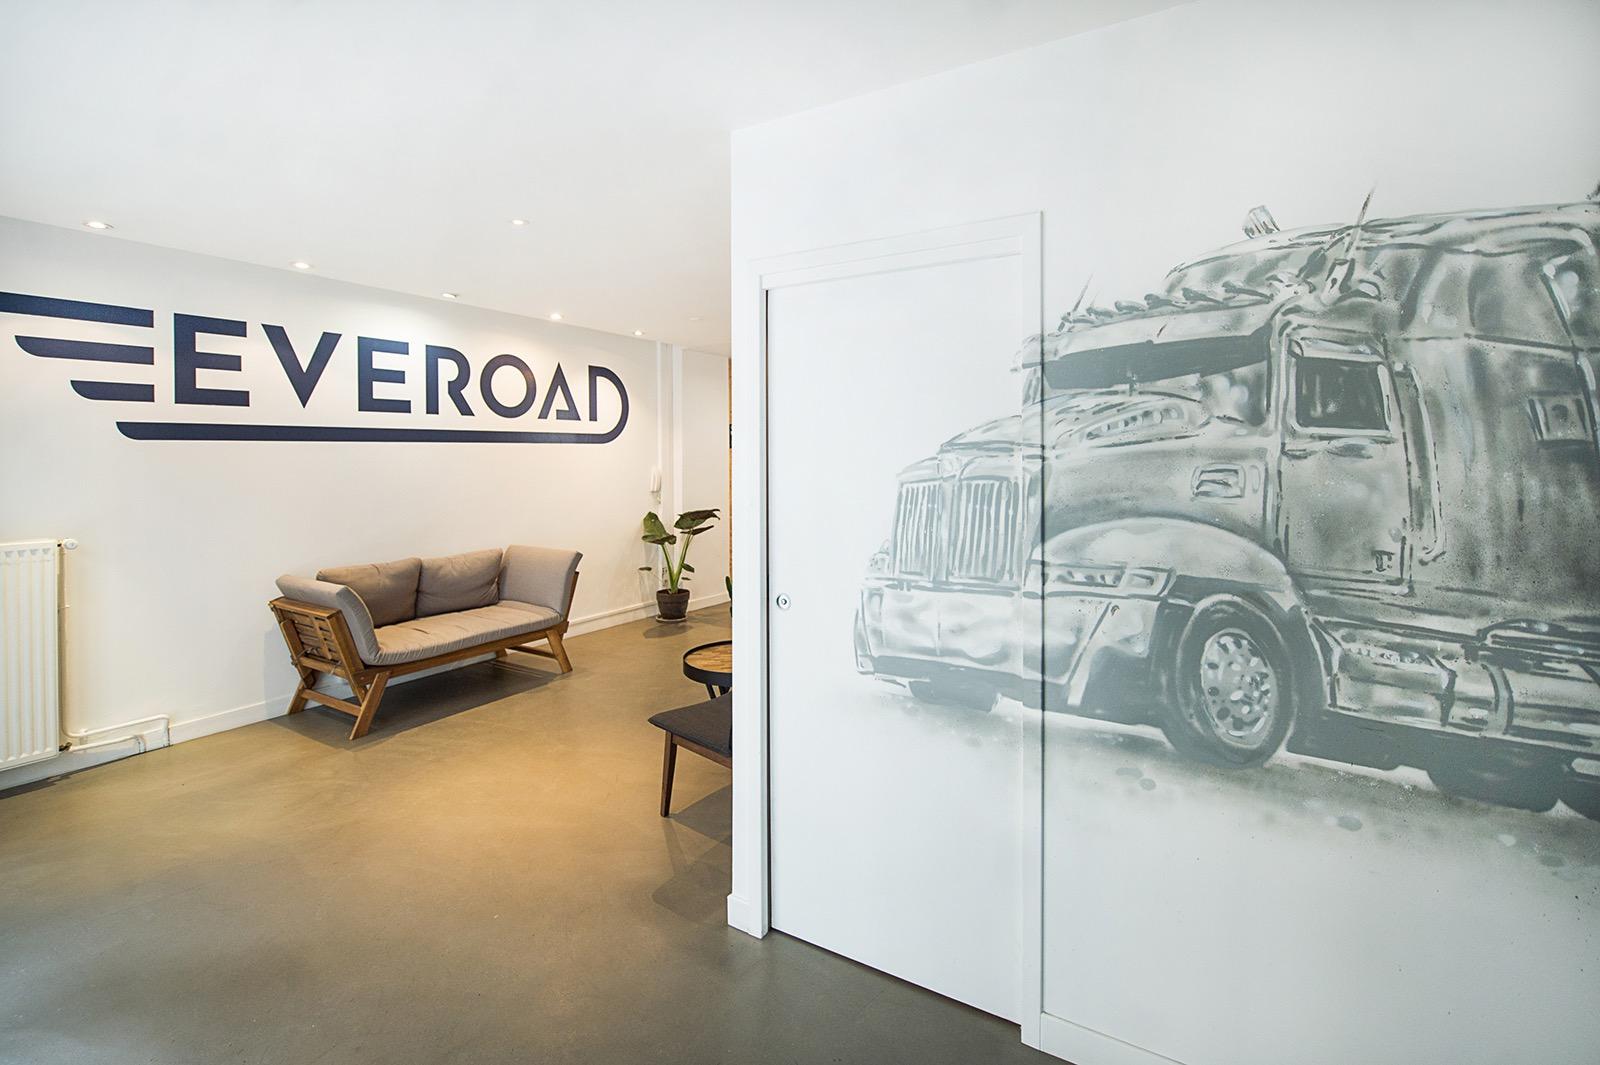 everoad-paris-office-2